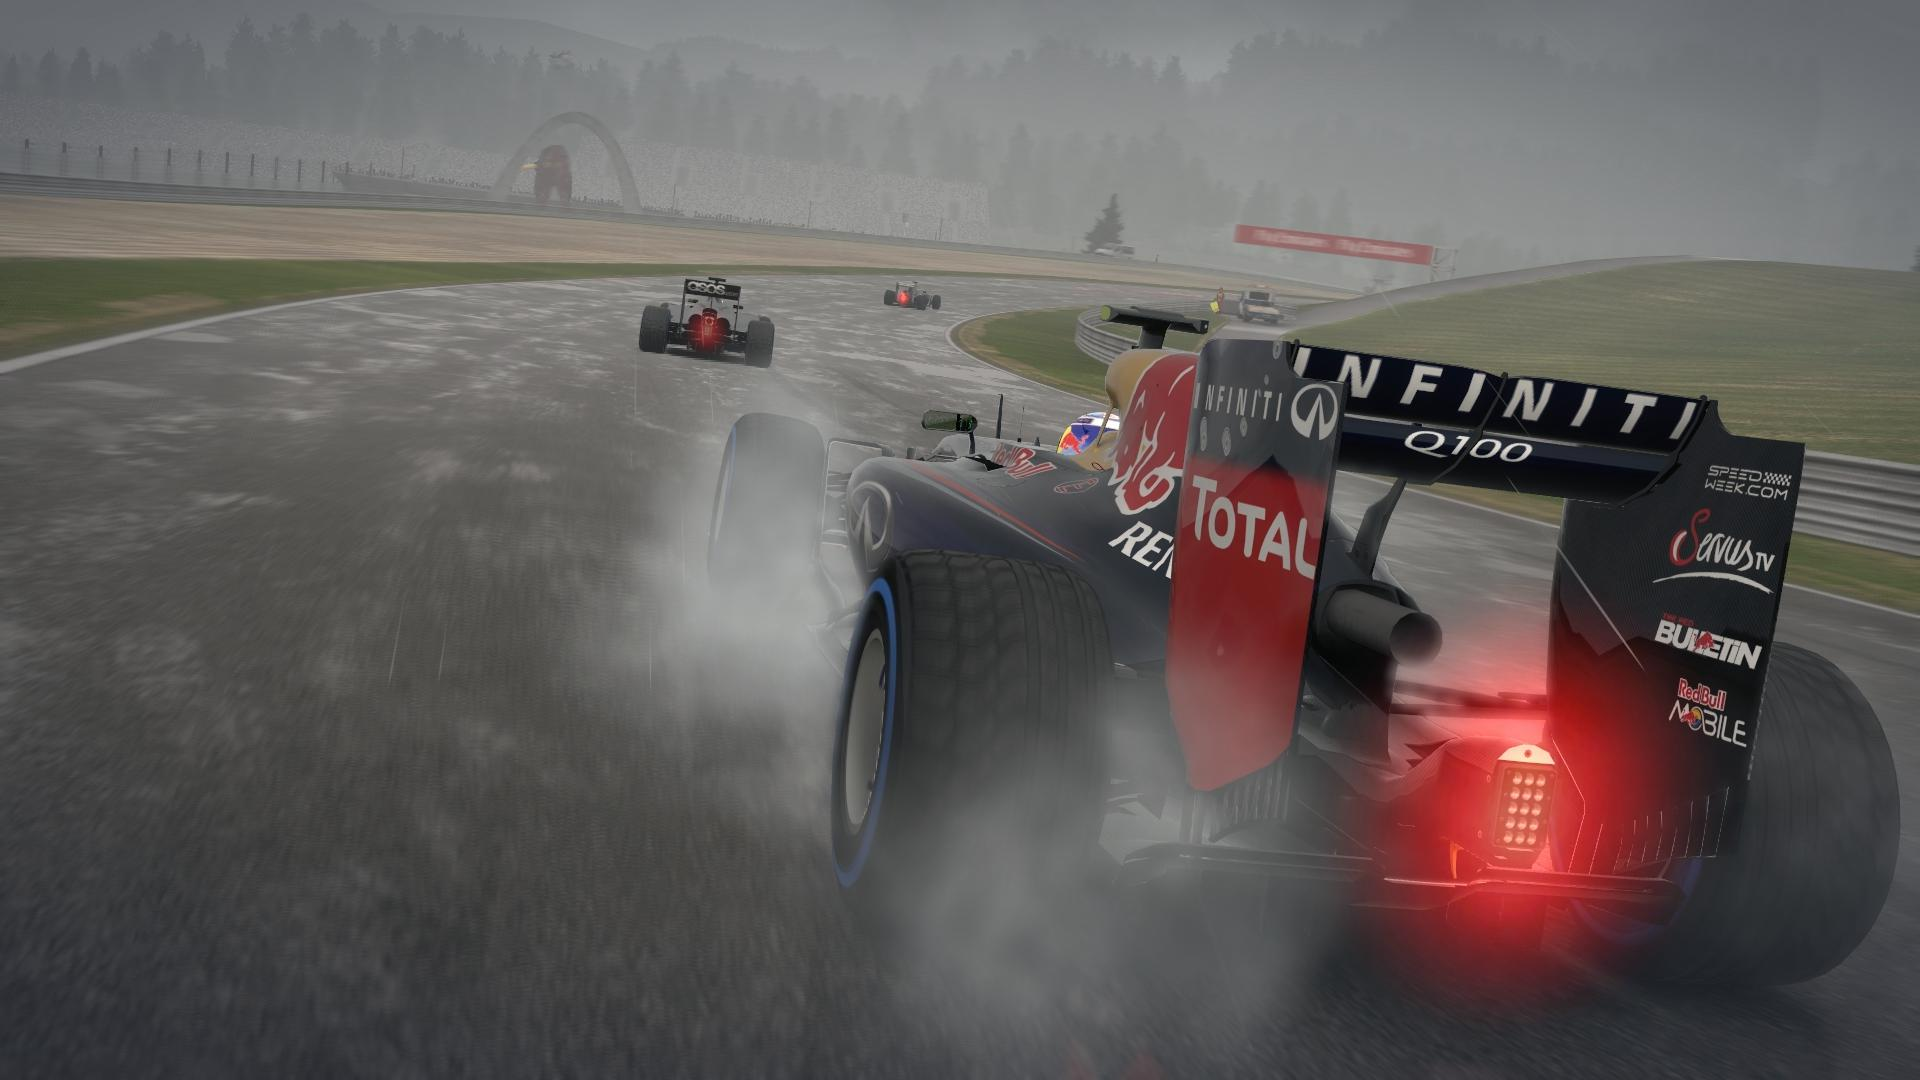 F1 2014 2710 12